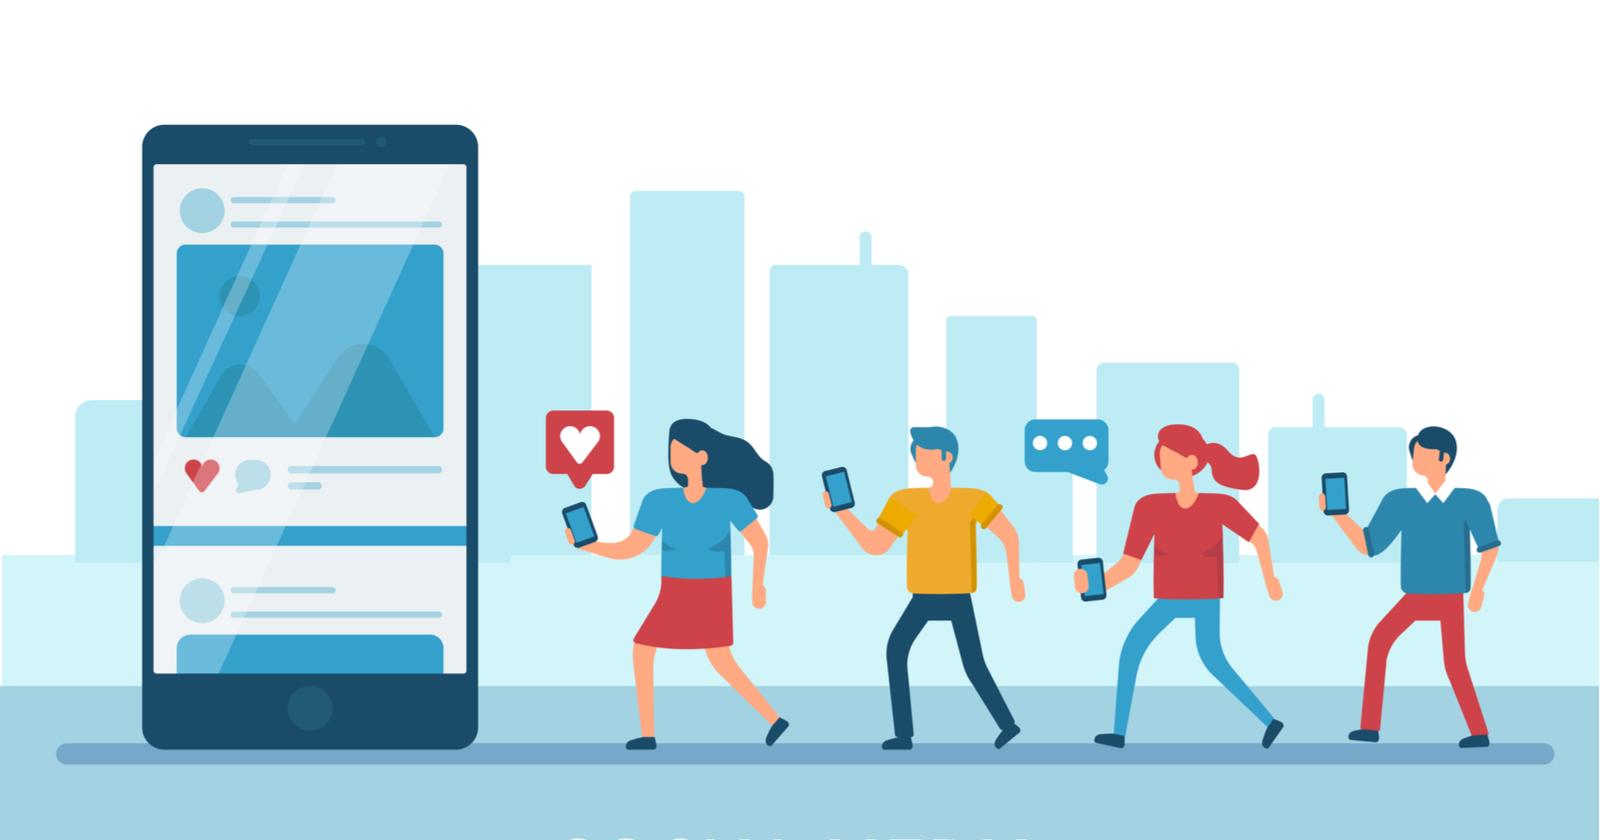 social media advertising infographic